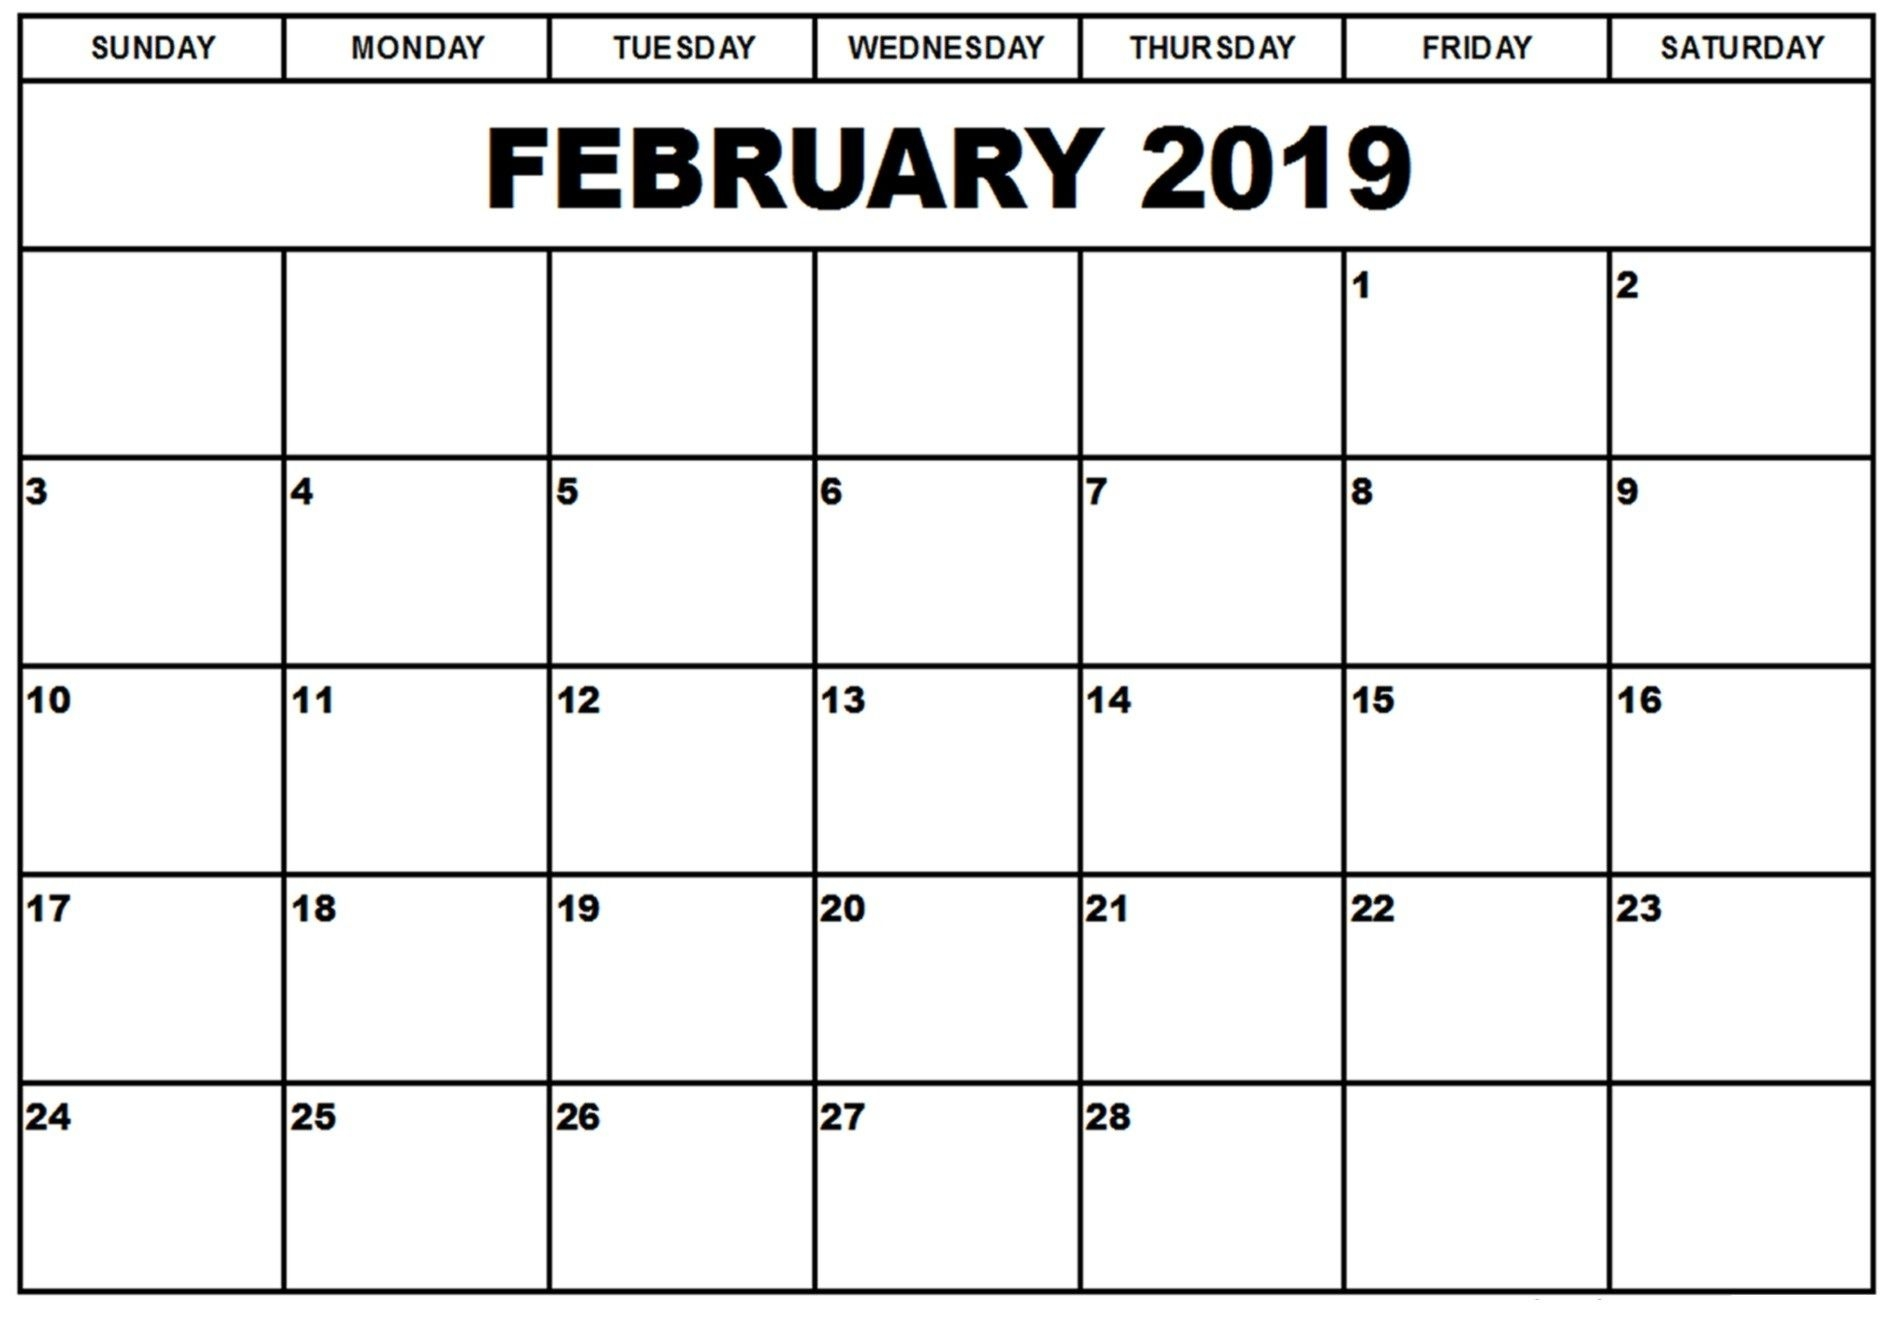 February 2019 Calendar Download February Calendar February 2019